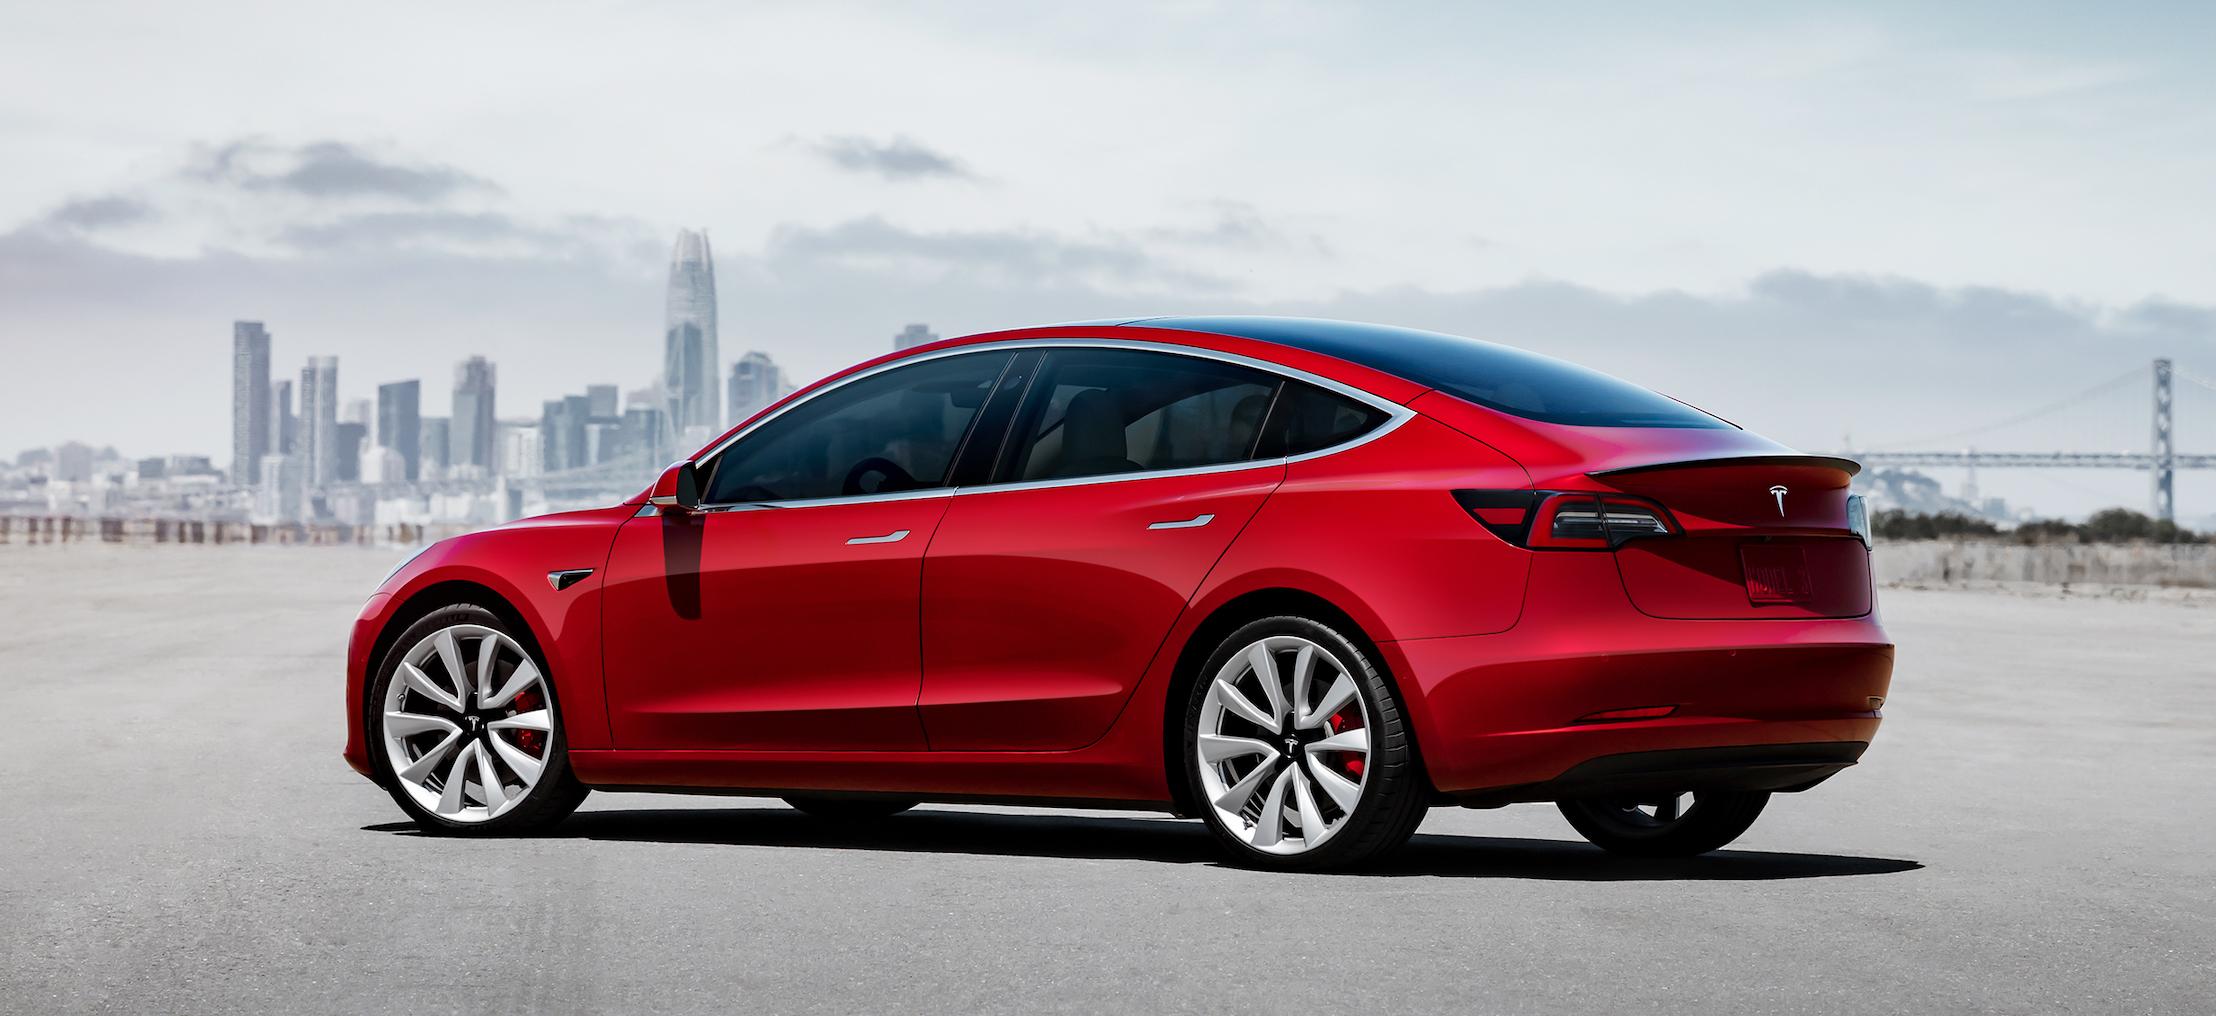 A red Tesla Model 3, a sleek compact luxury-sports sedan